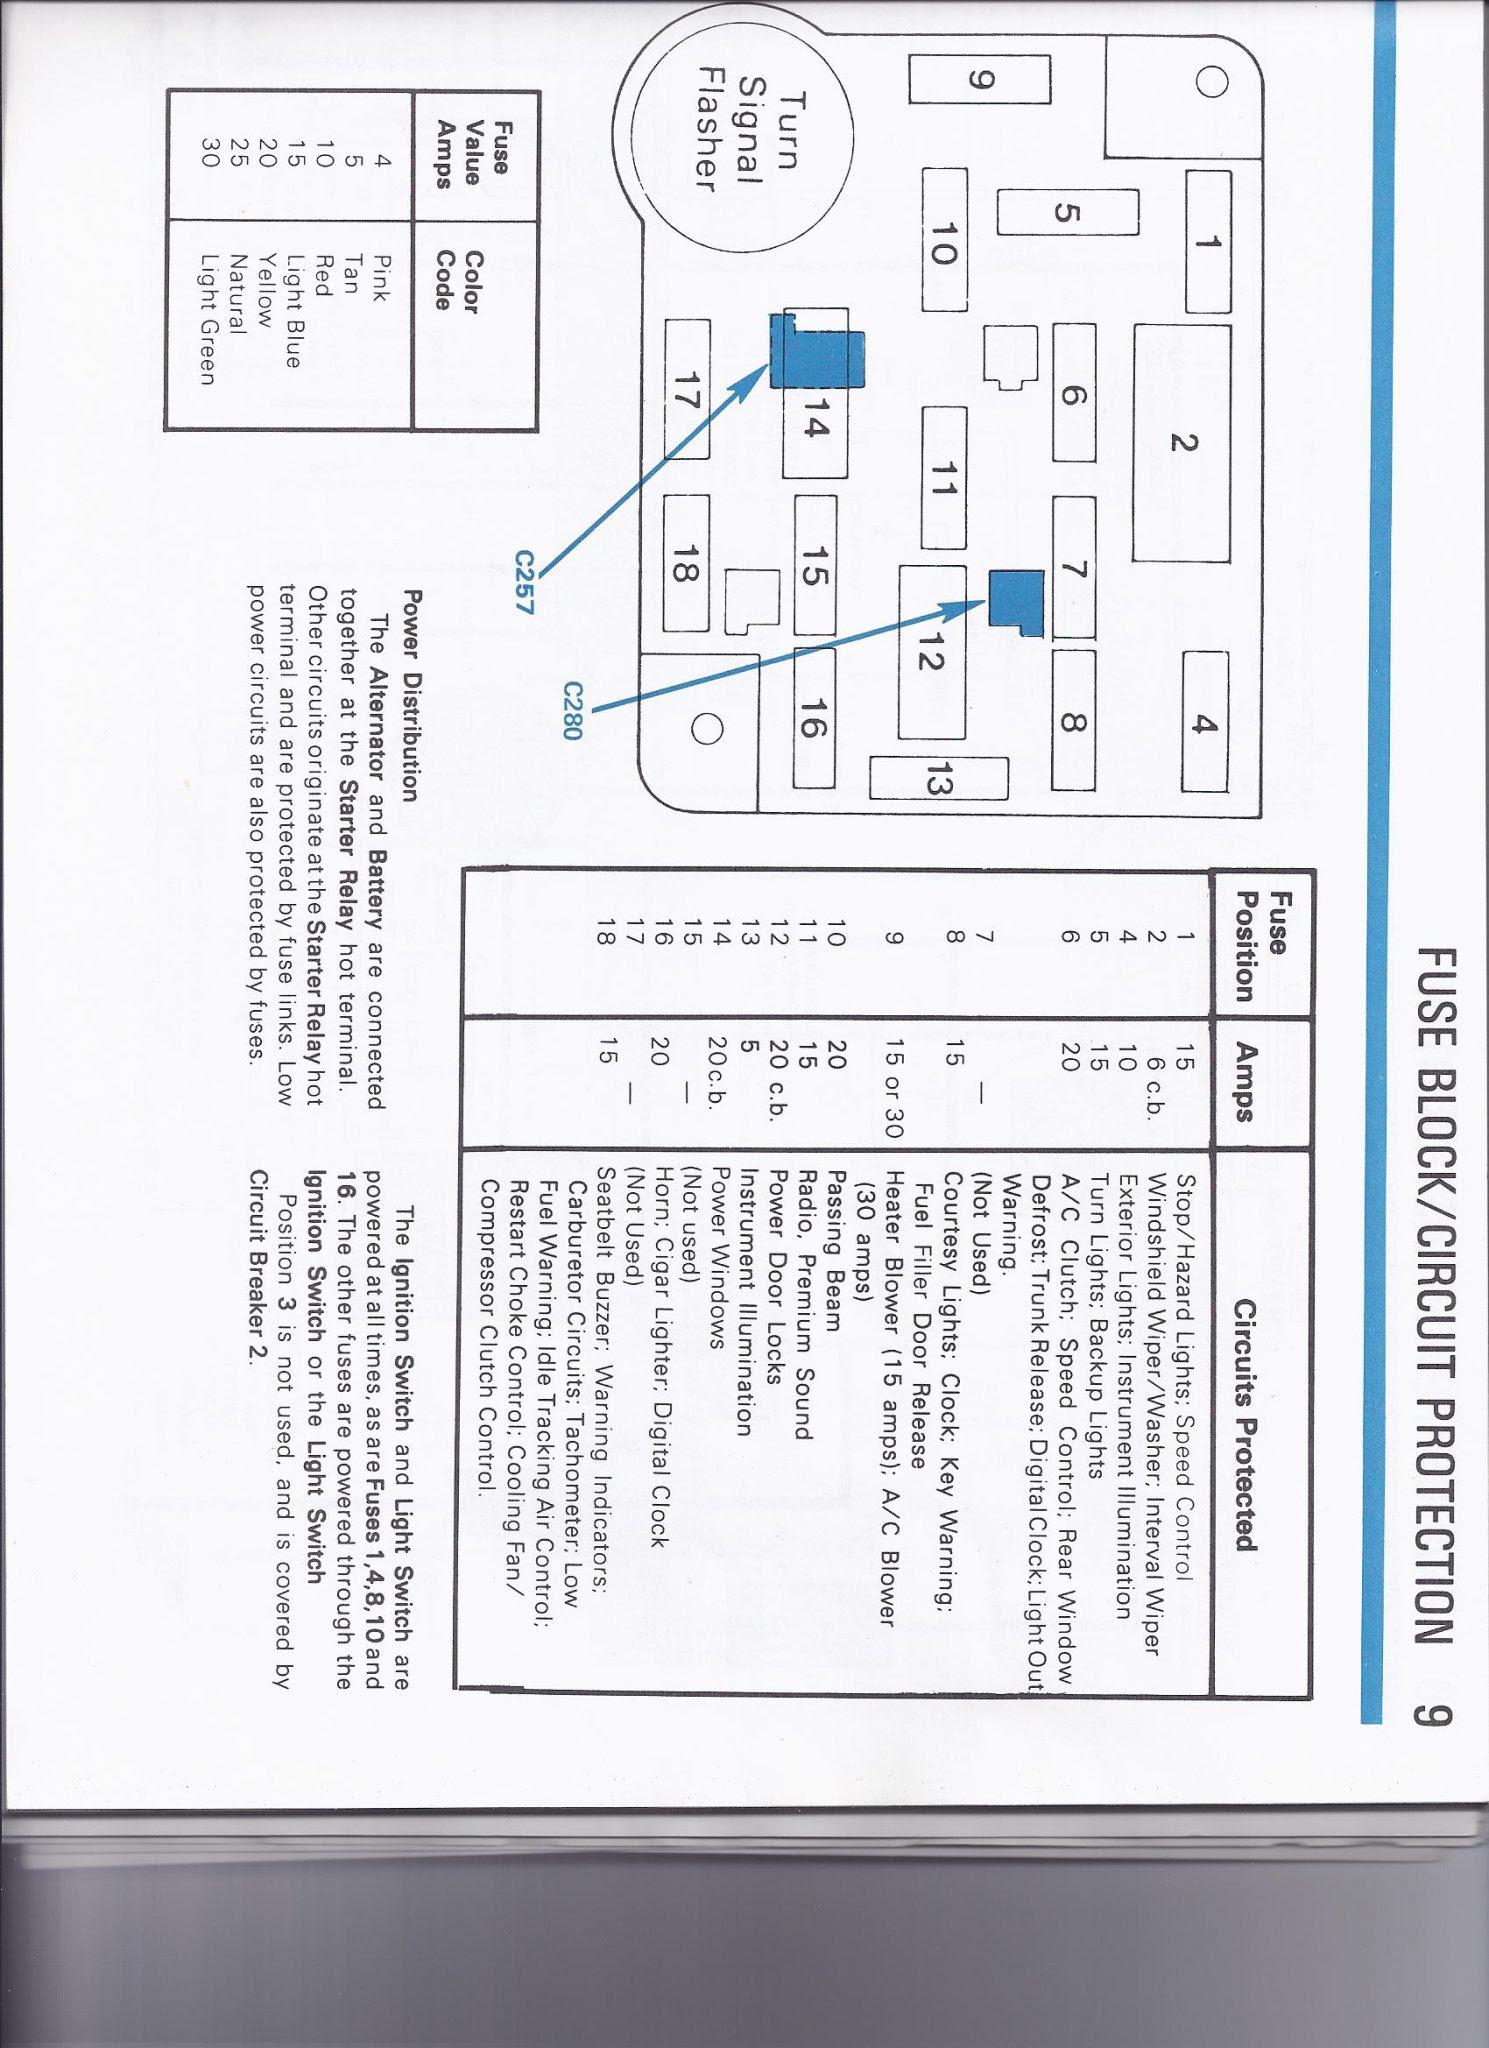 1970 mustang fuse block diagram - wiring diagram structure write-tension -  write-tension.vinopoggioamorelli.it  vinopoggioamorelli.it